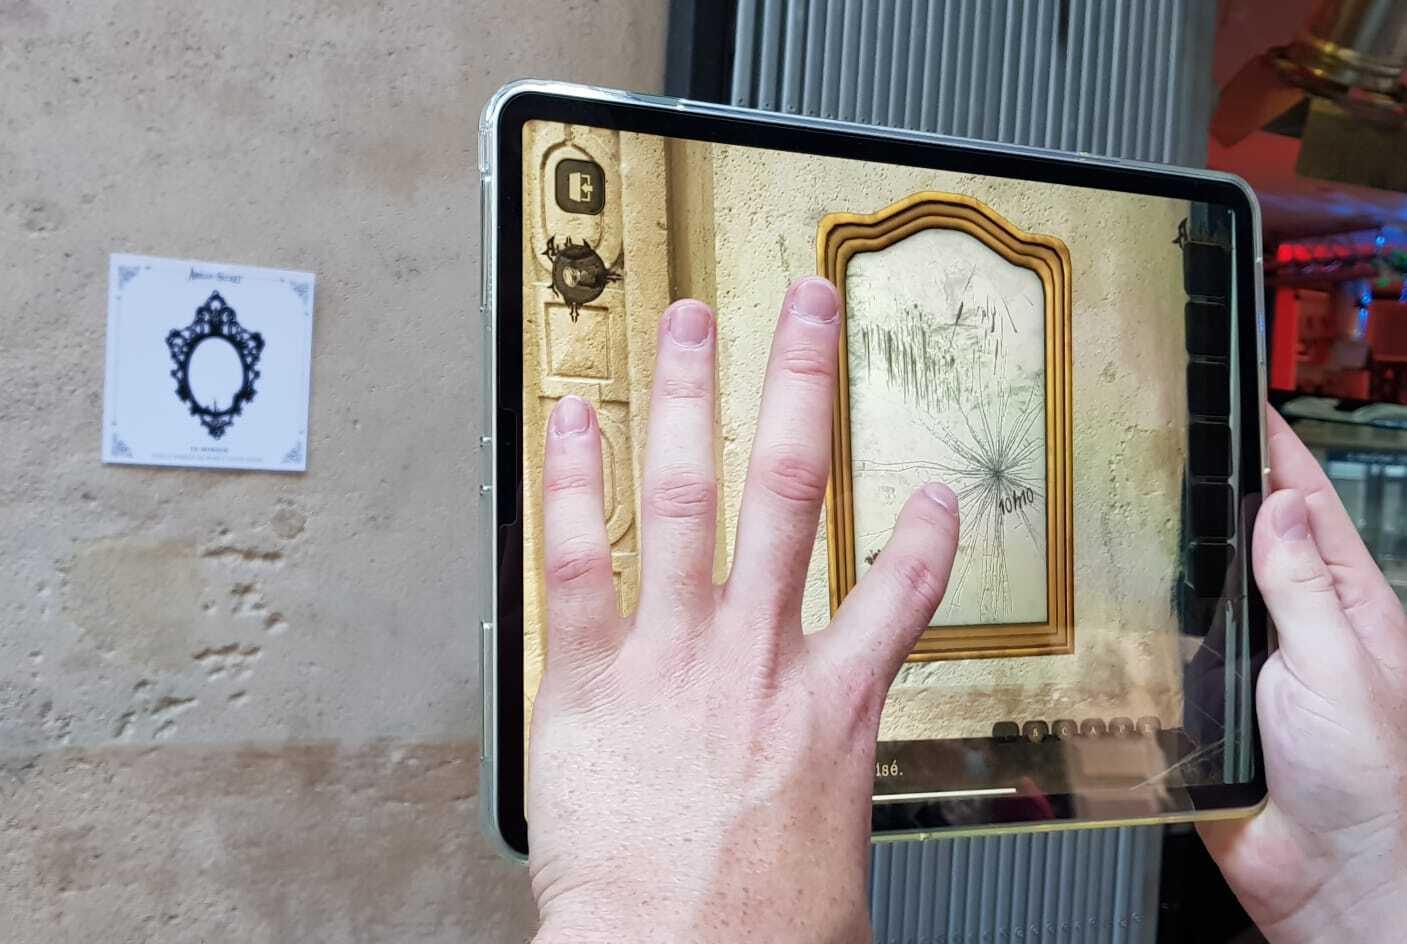 Amelia's Secret: Augmented reality escape game